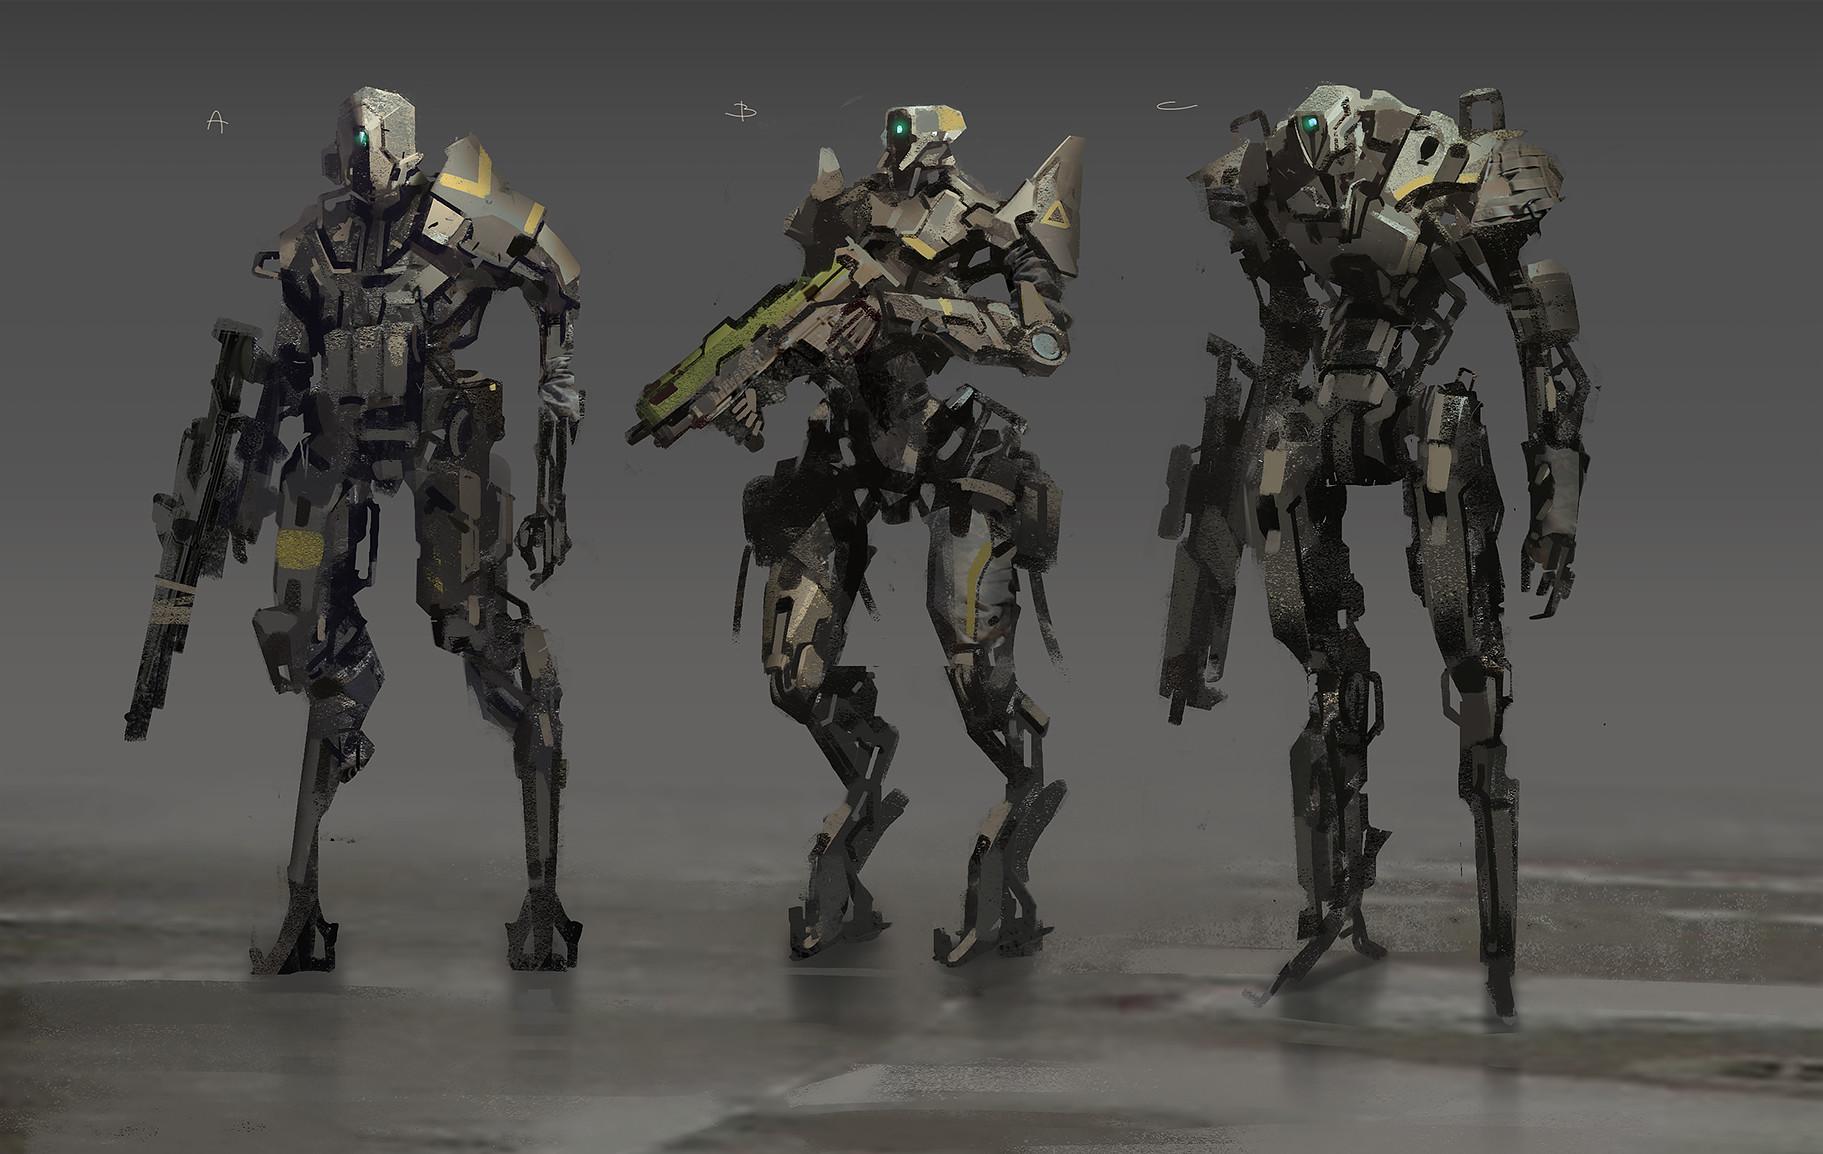 Daryl mandryk roughrobots